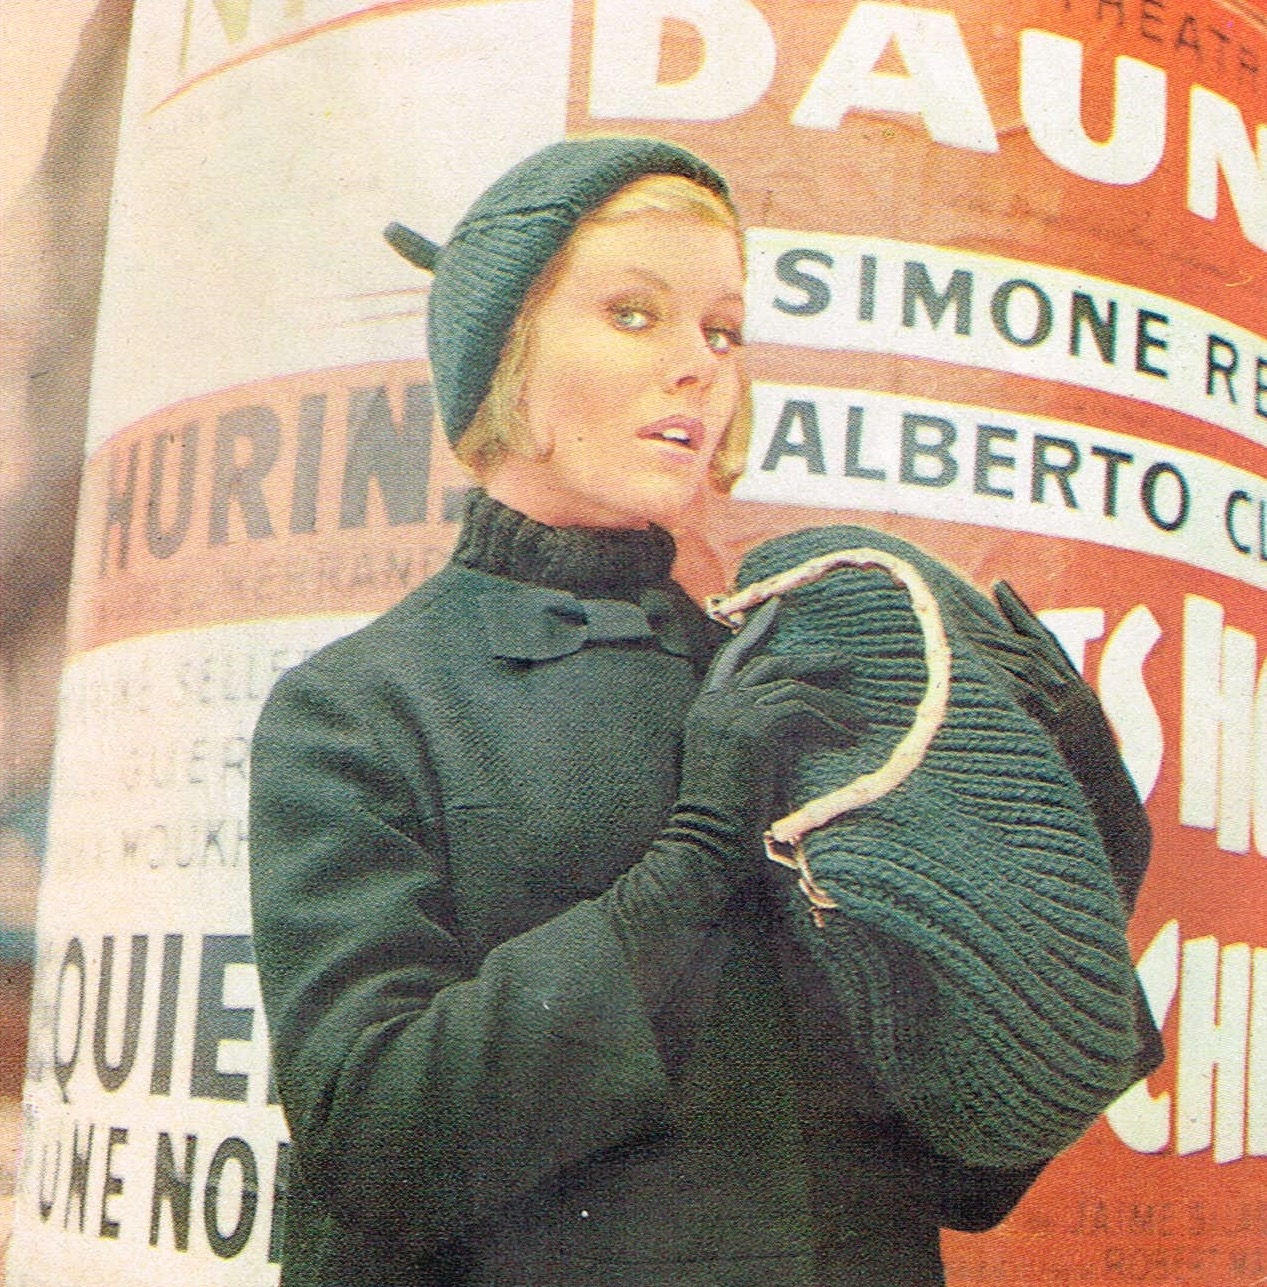 88a65271b Vintage knitting pattern - Paris Beret and Chunky Bag - PDF knitting  pattern - 60s 1960s